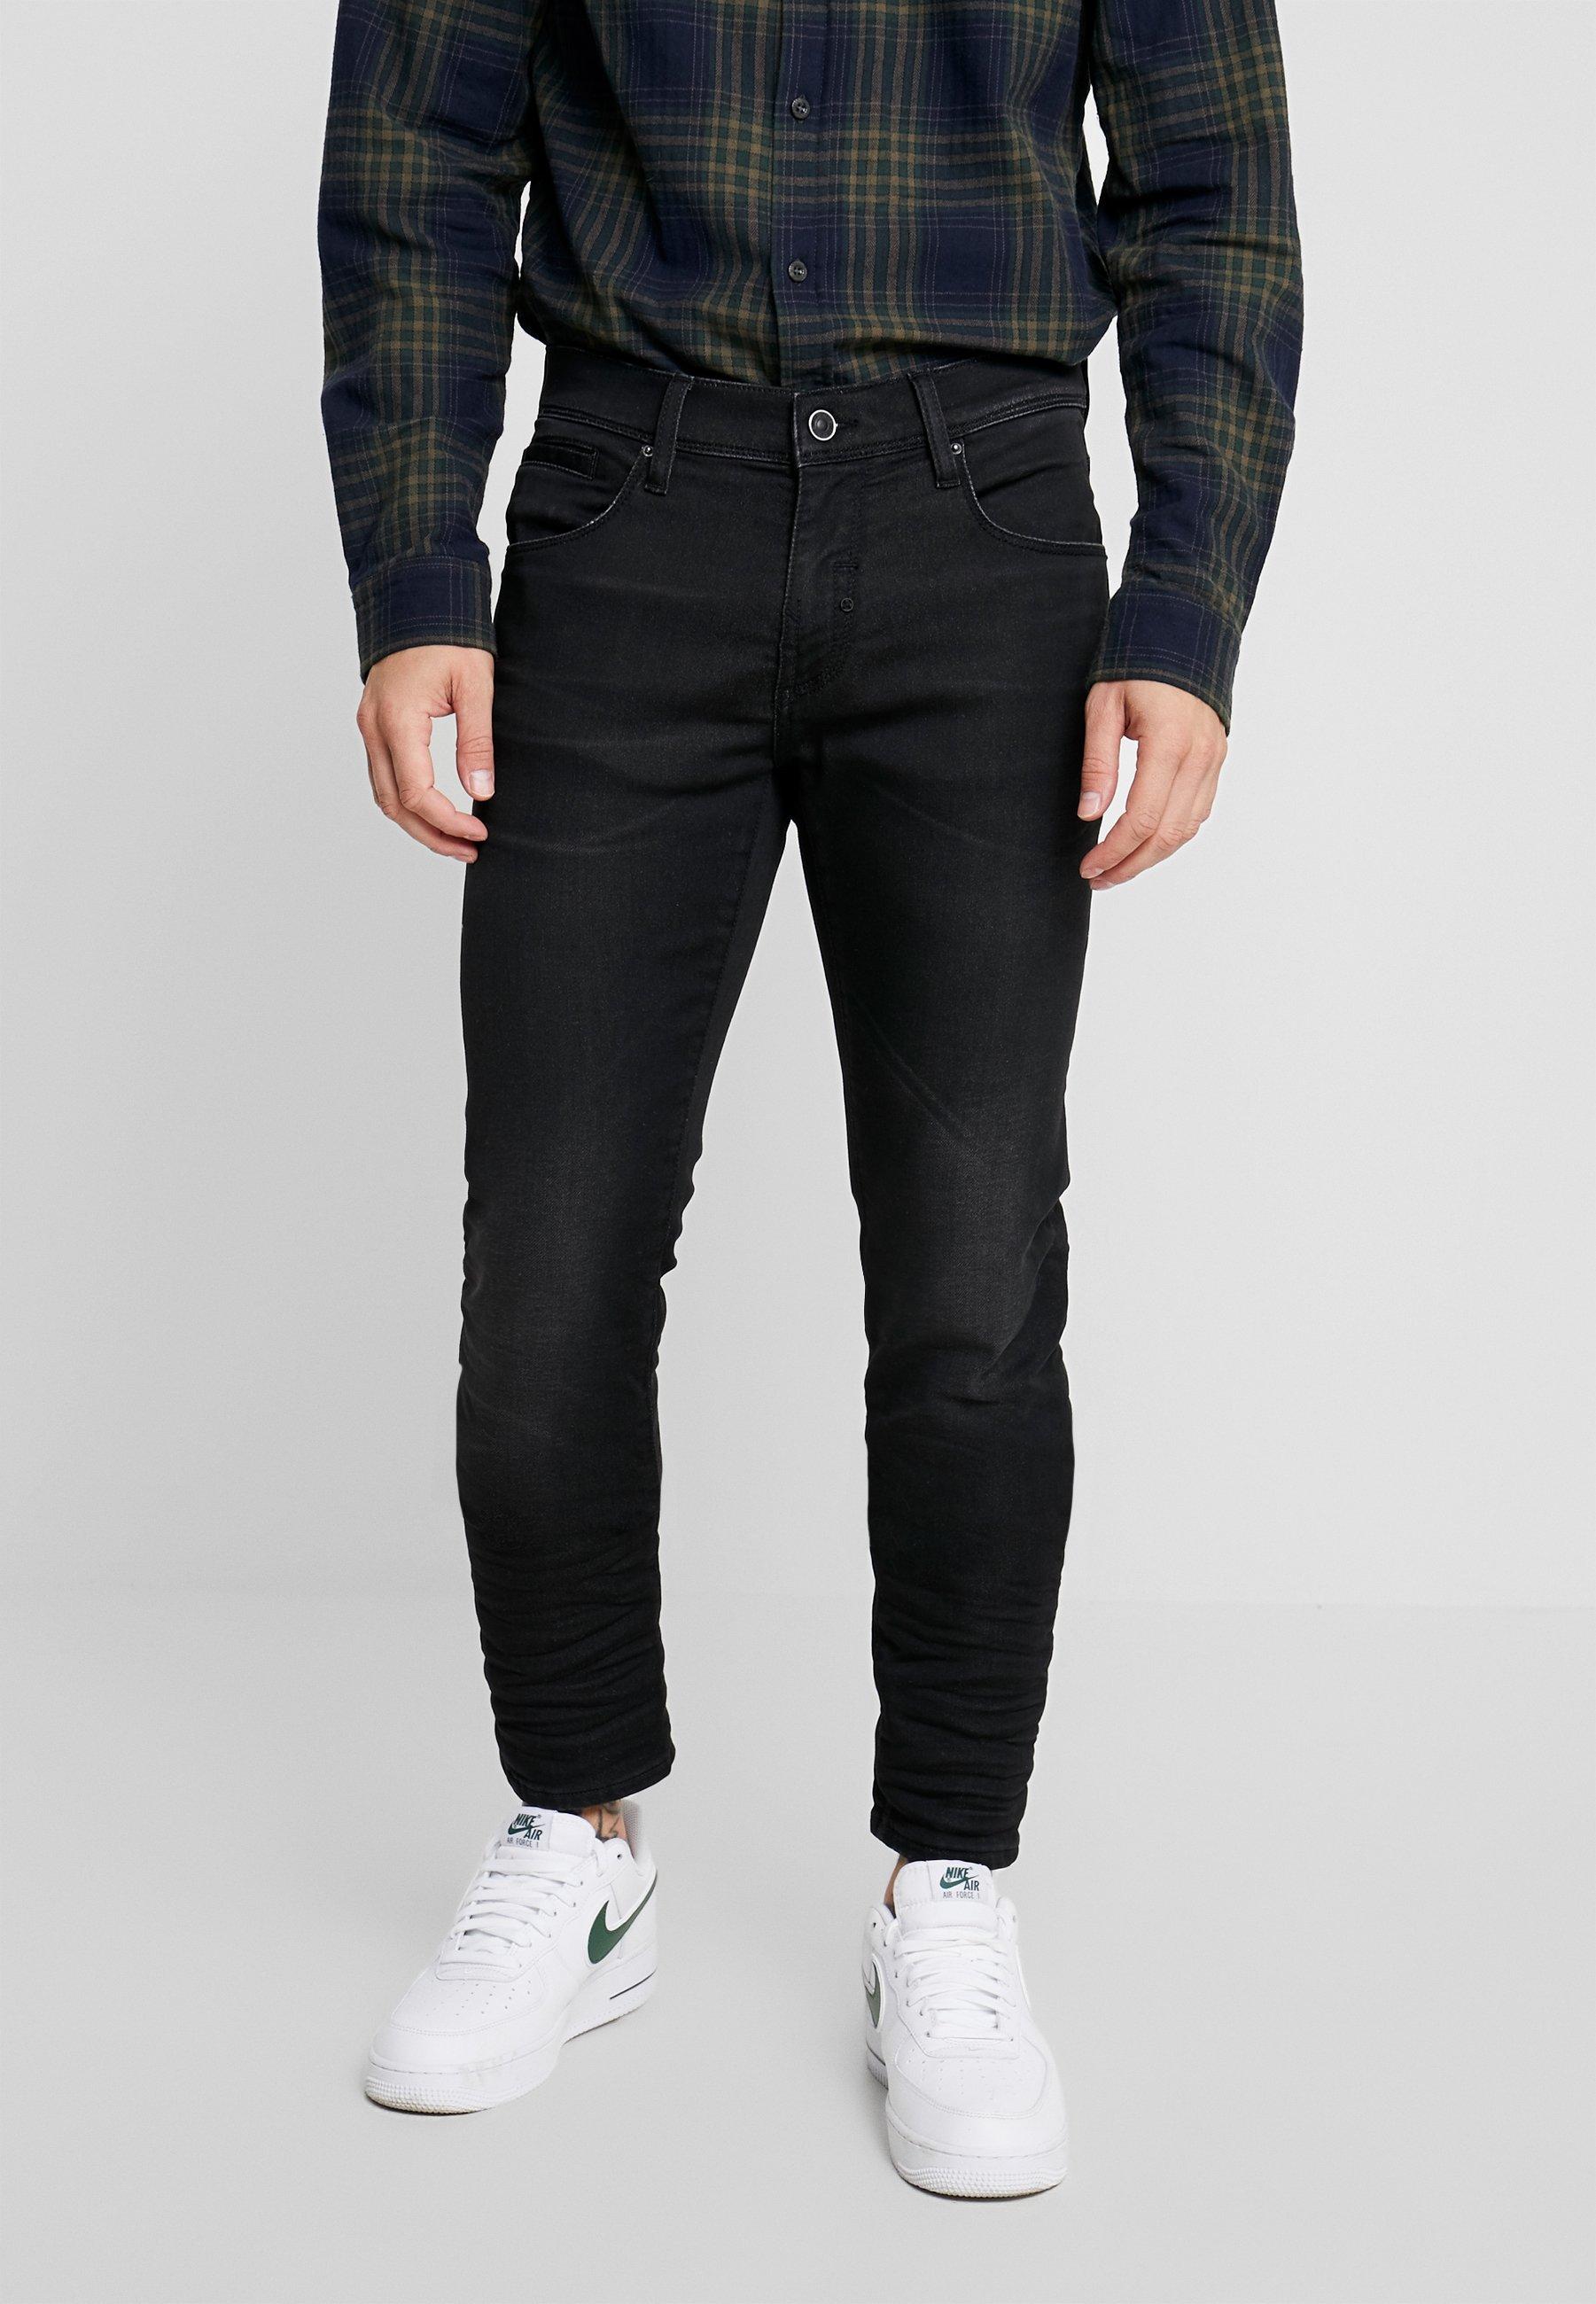 Antony Skinny Morato Black MetalJeans Barret fm6YbI7vgy